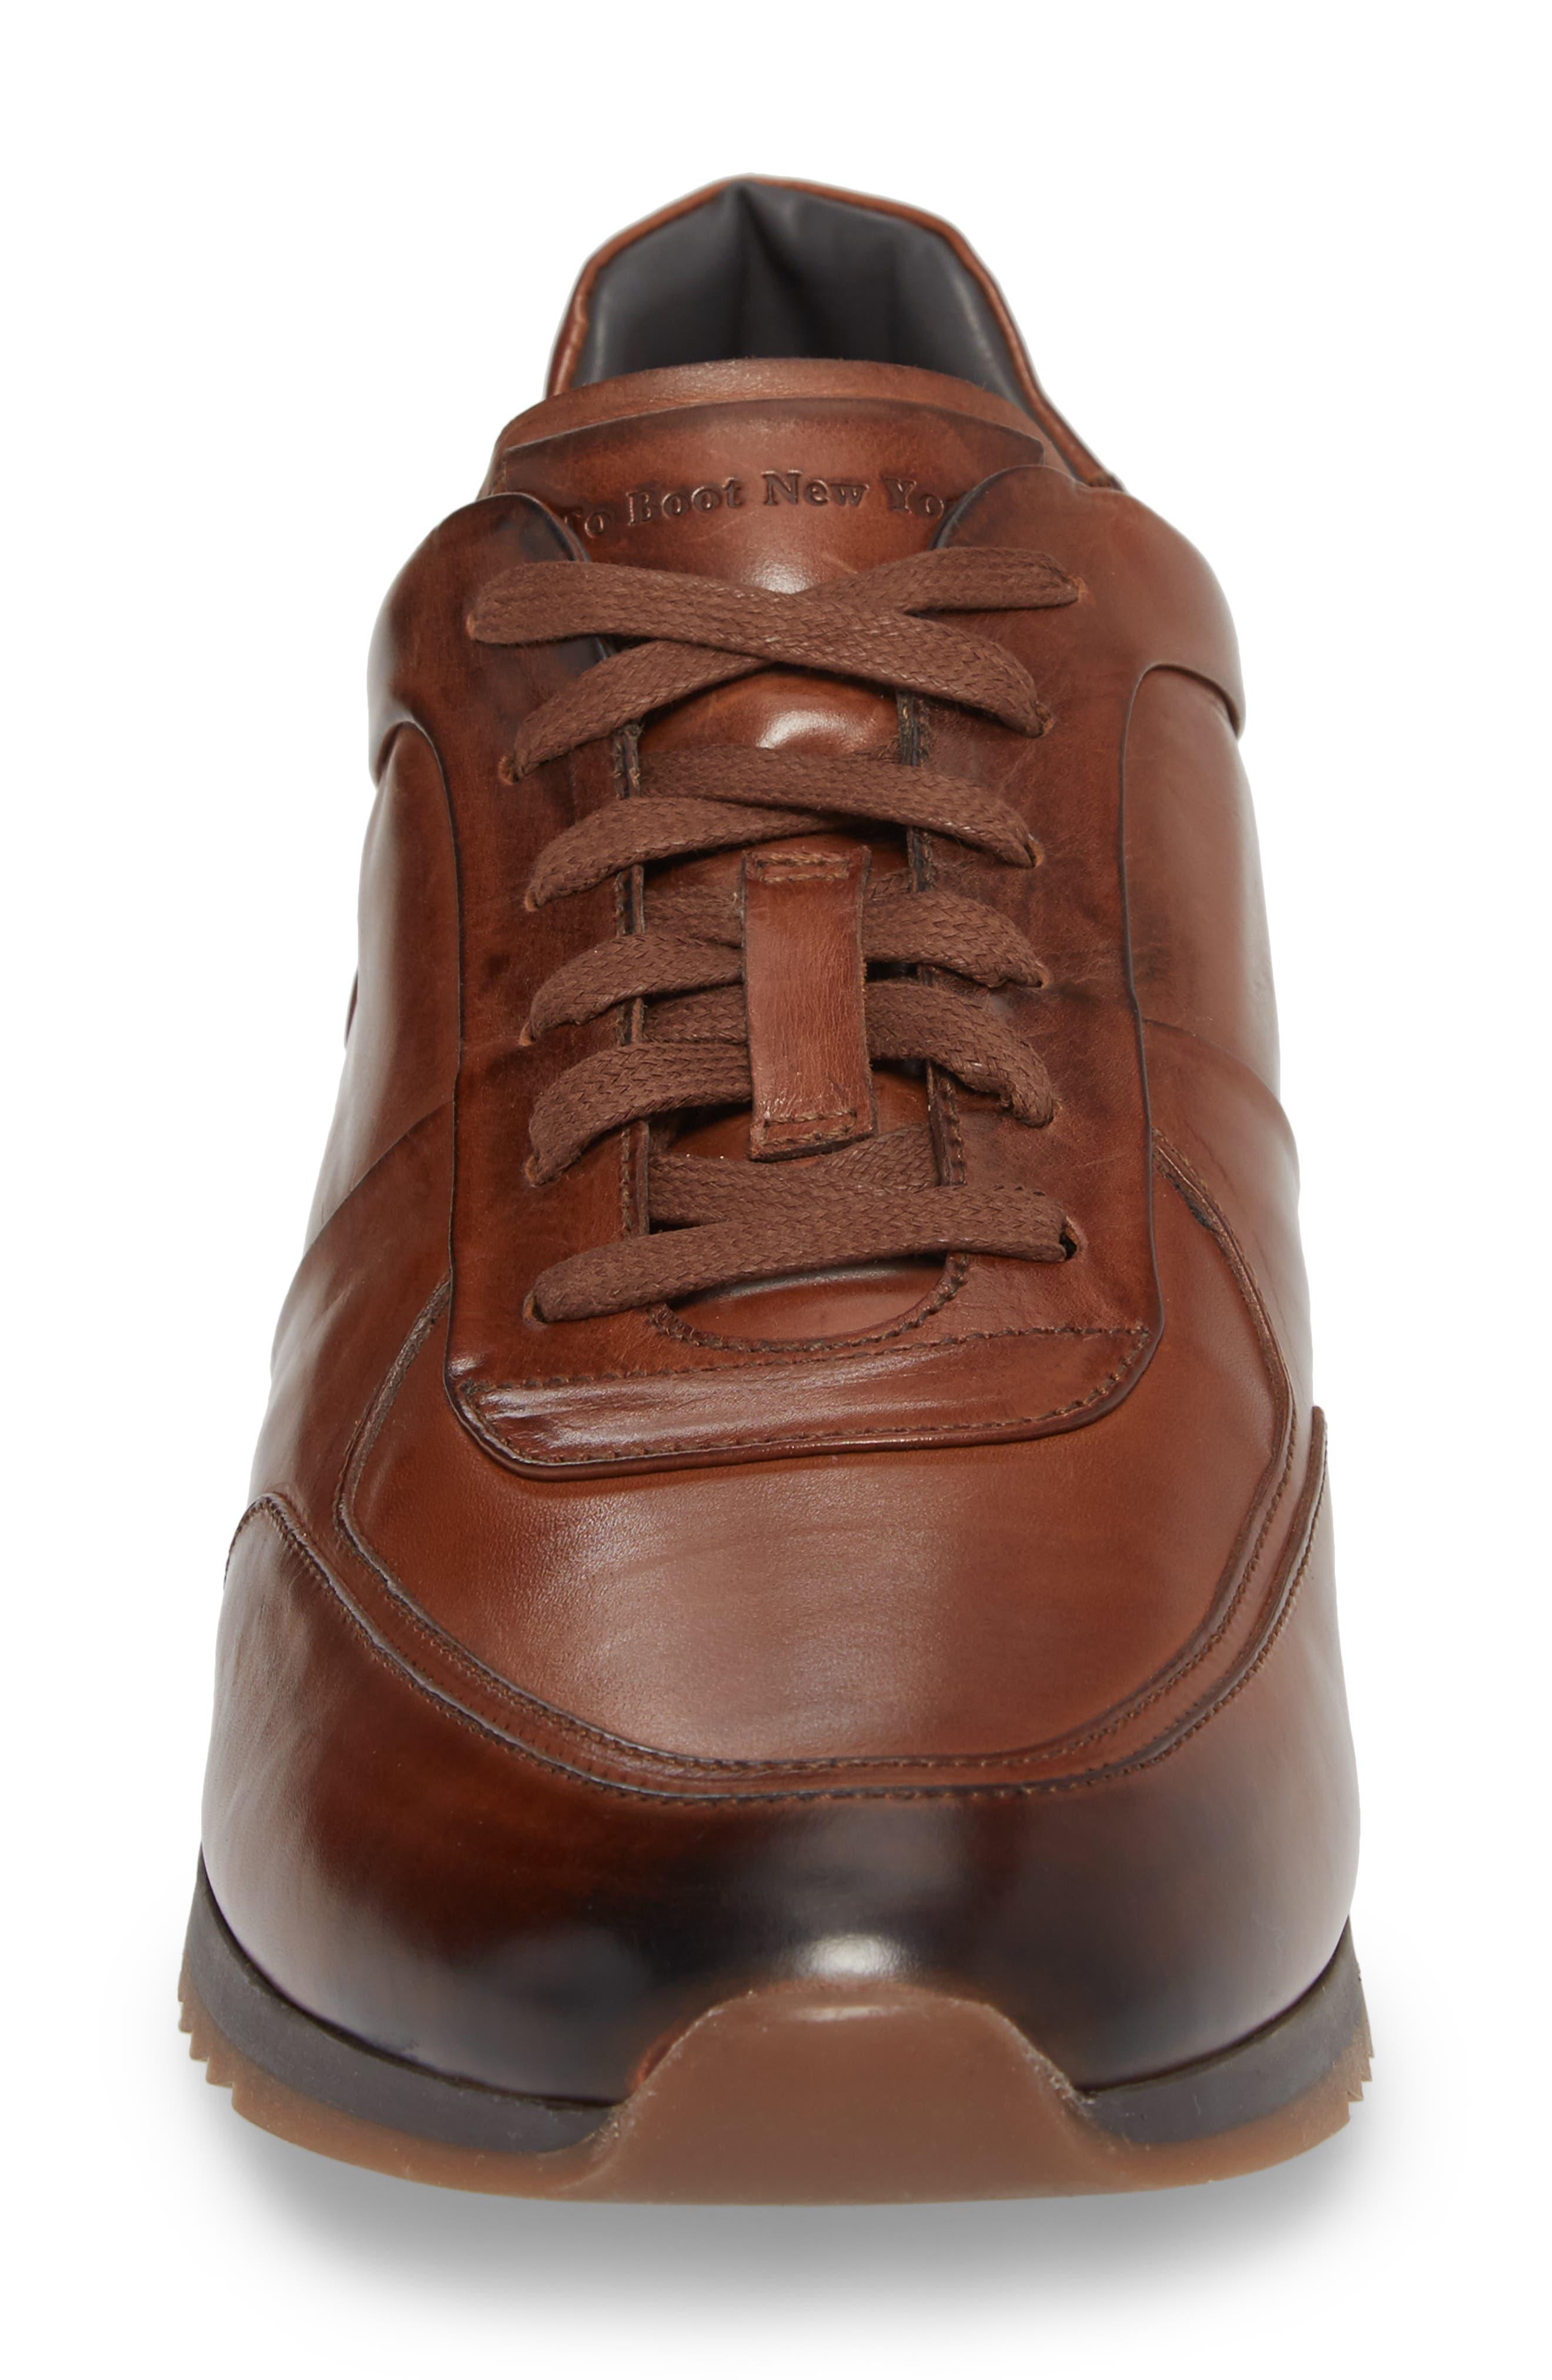 Lenox Low Top Sneaker,                             Alternate thumbnail 4, color,                             Tan Leather